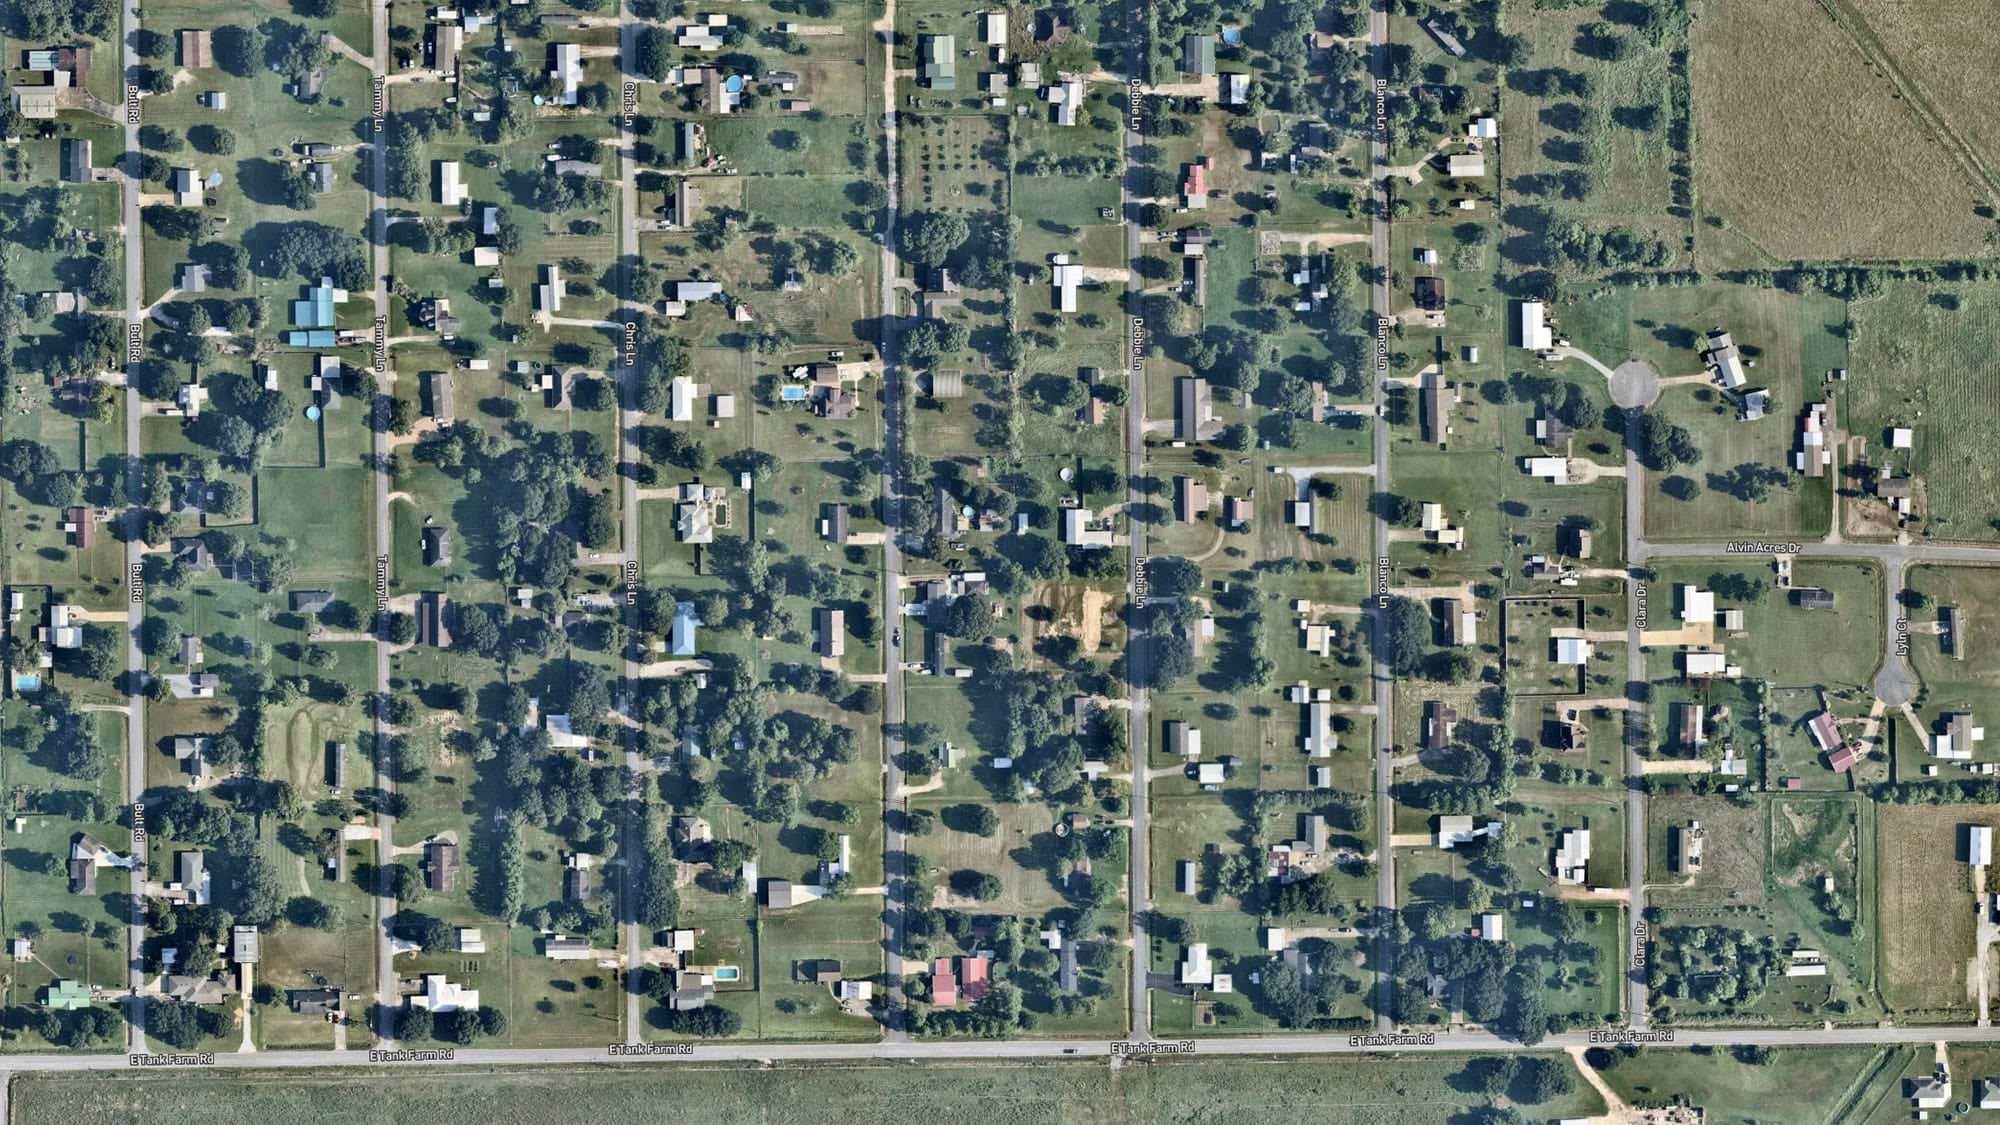 Lake Charles, Louisiana (East of Lake Charles Regional Airport) before Laura